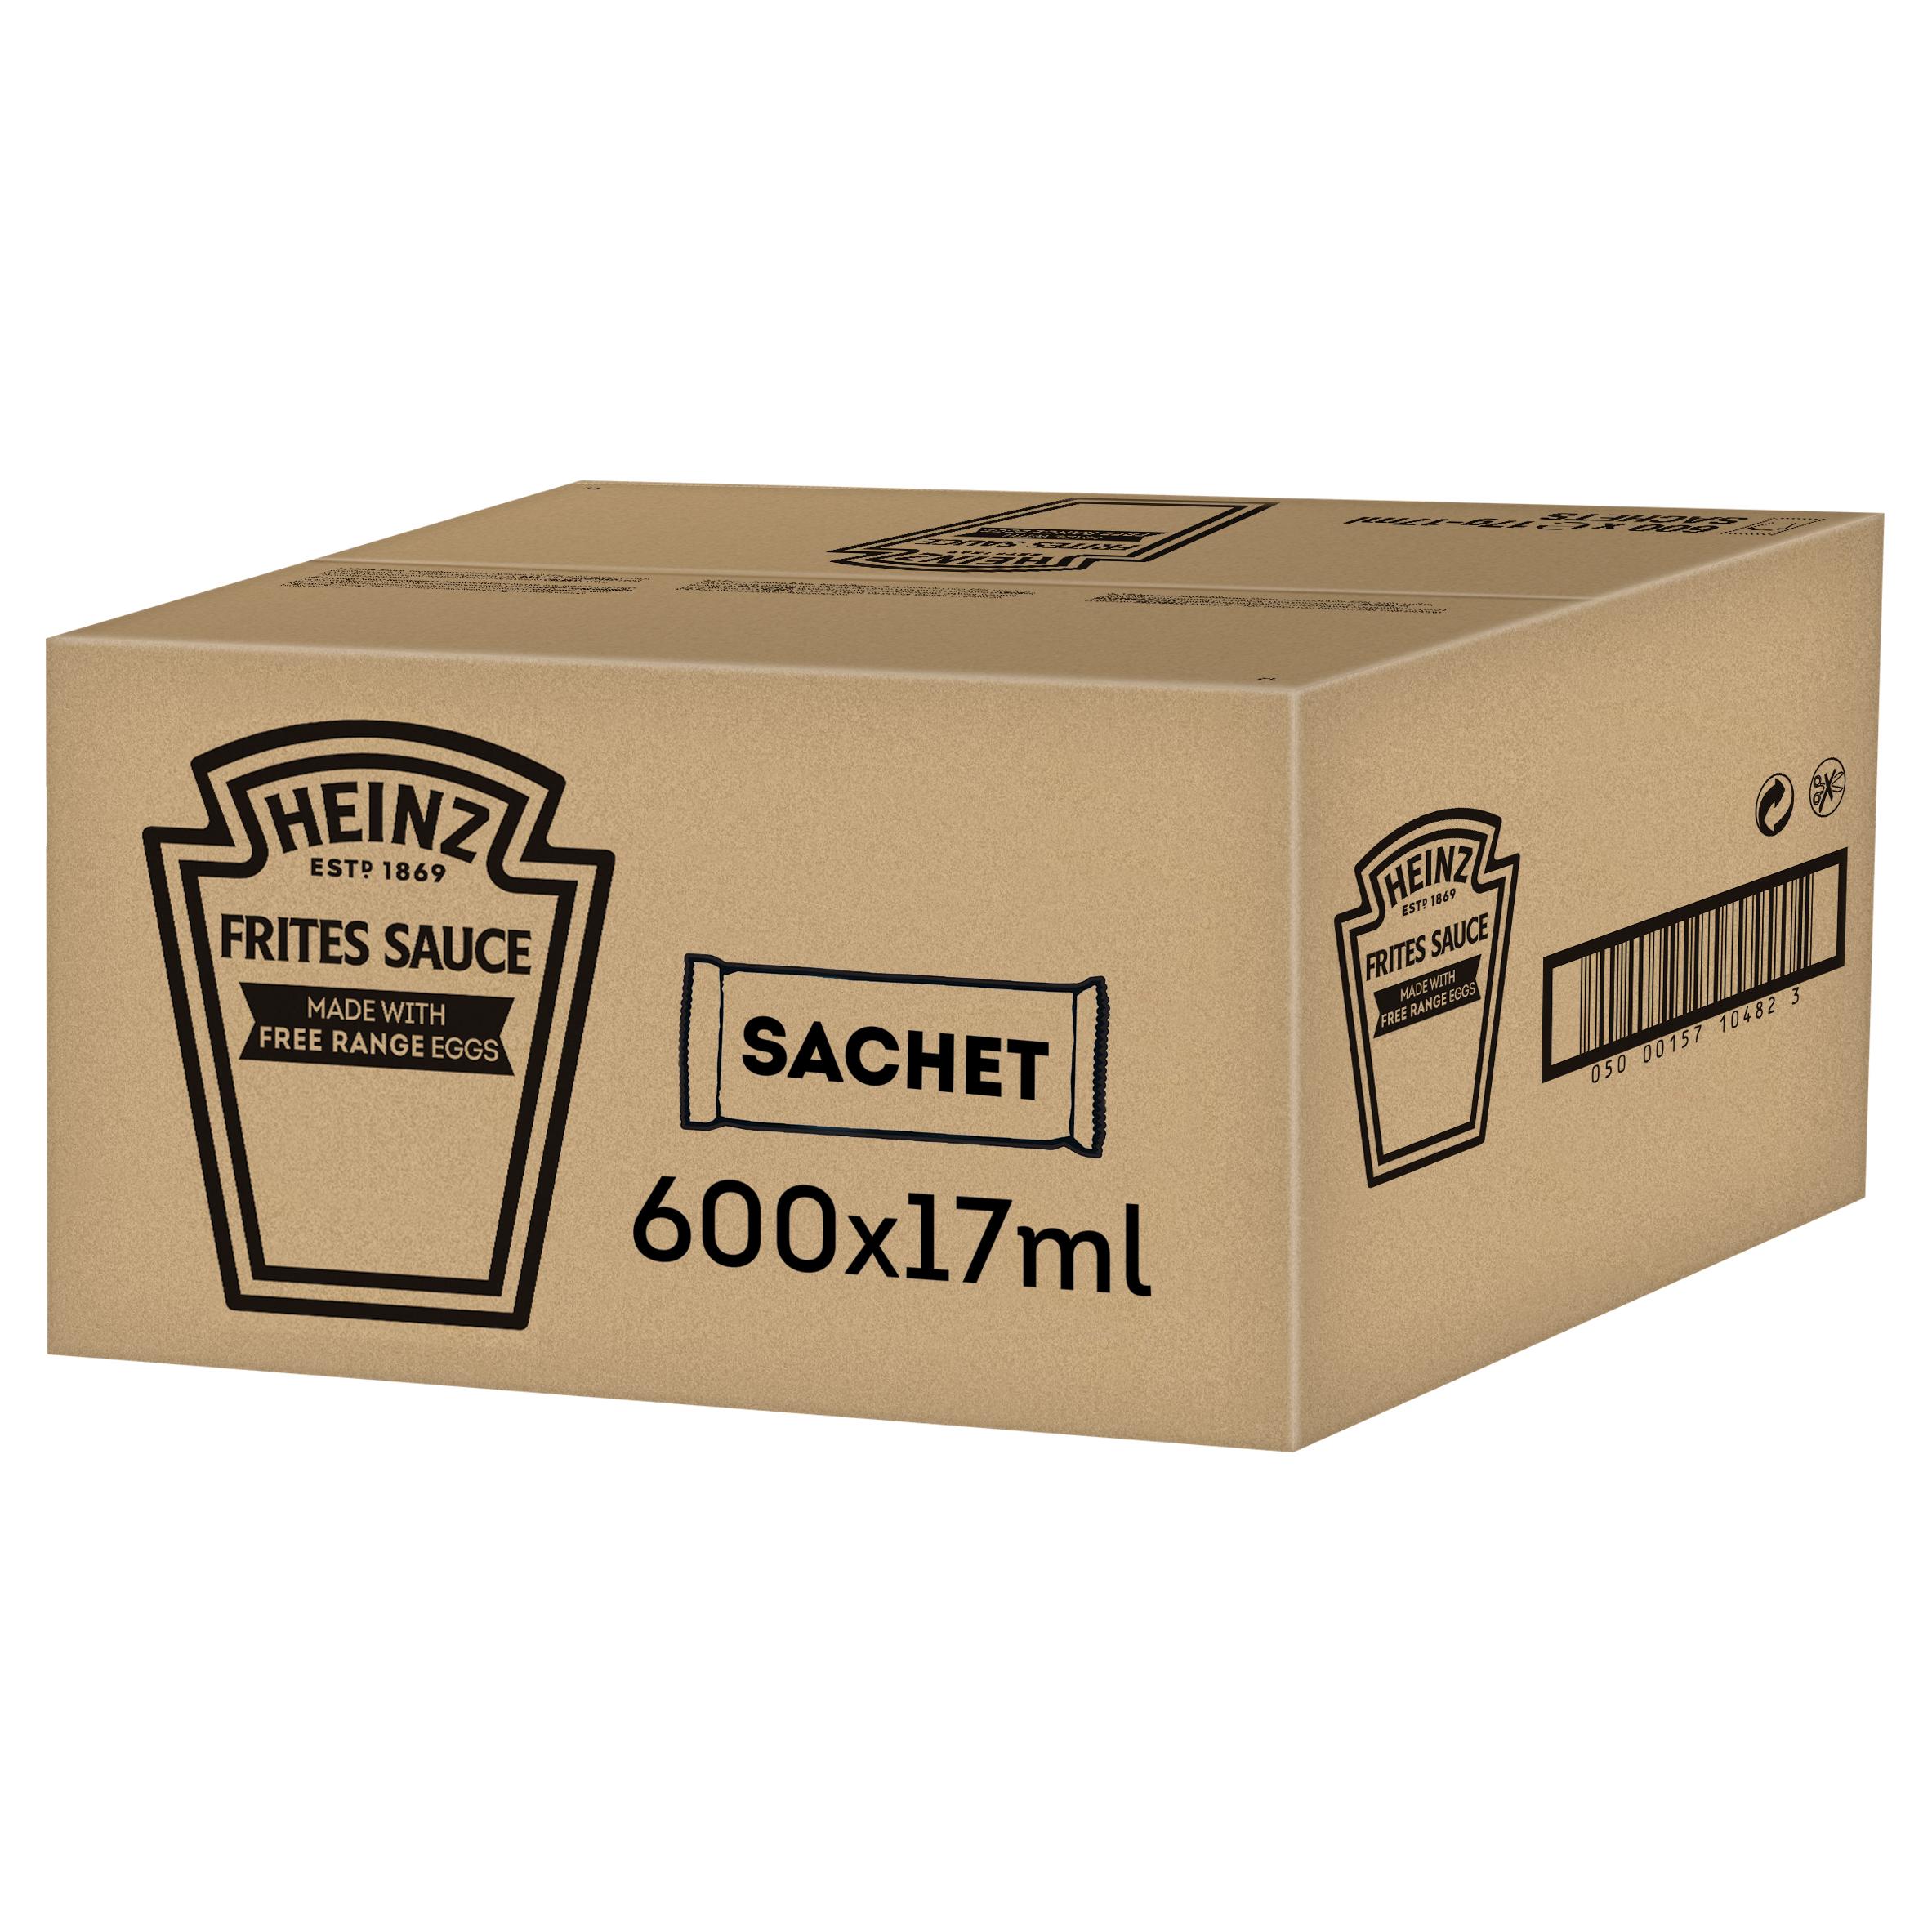 Heinz Frites Sauce17ml Sachet